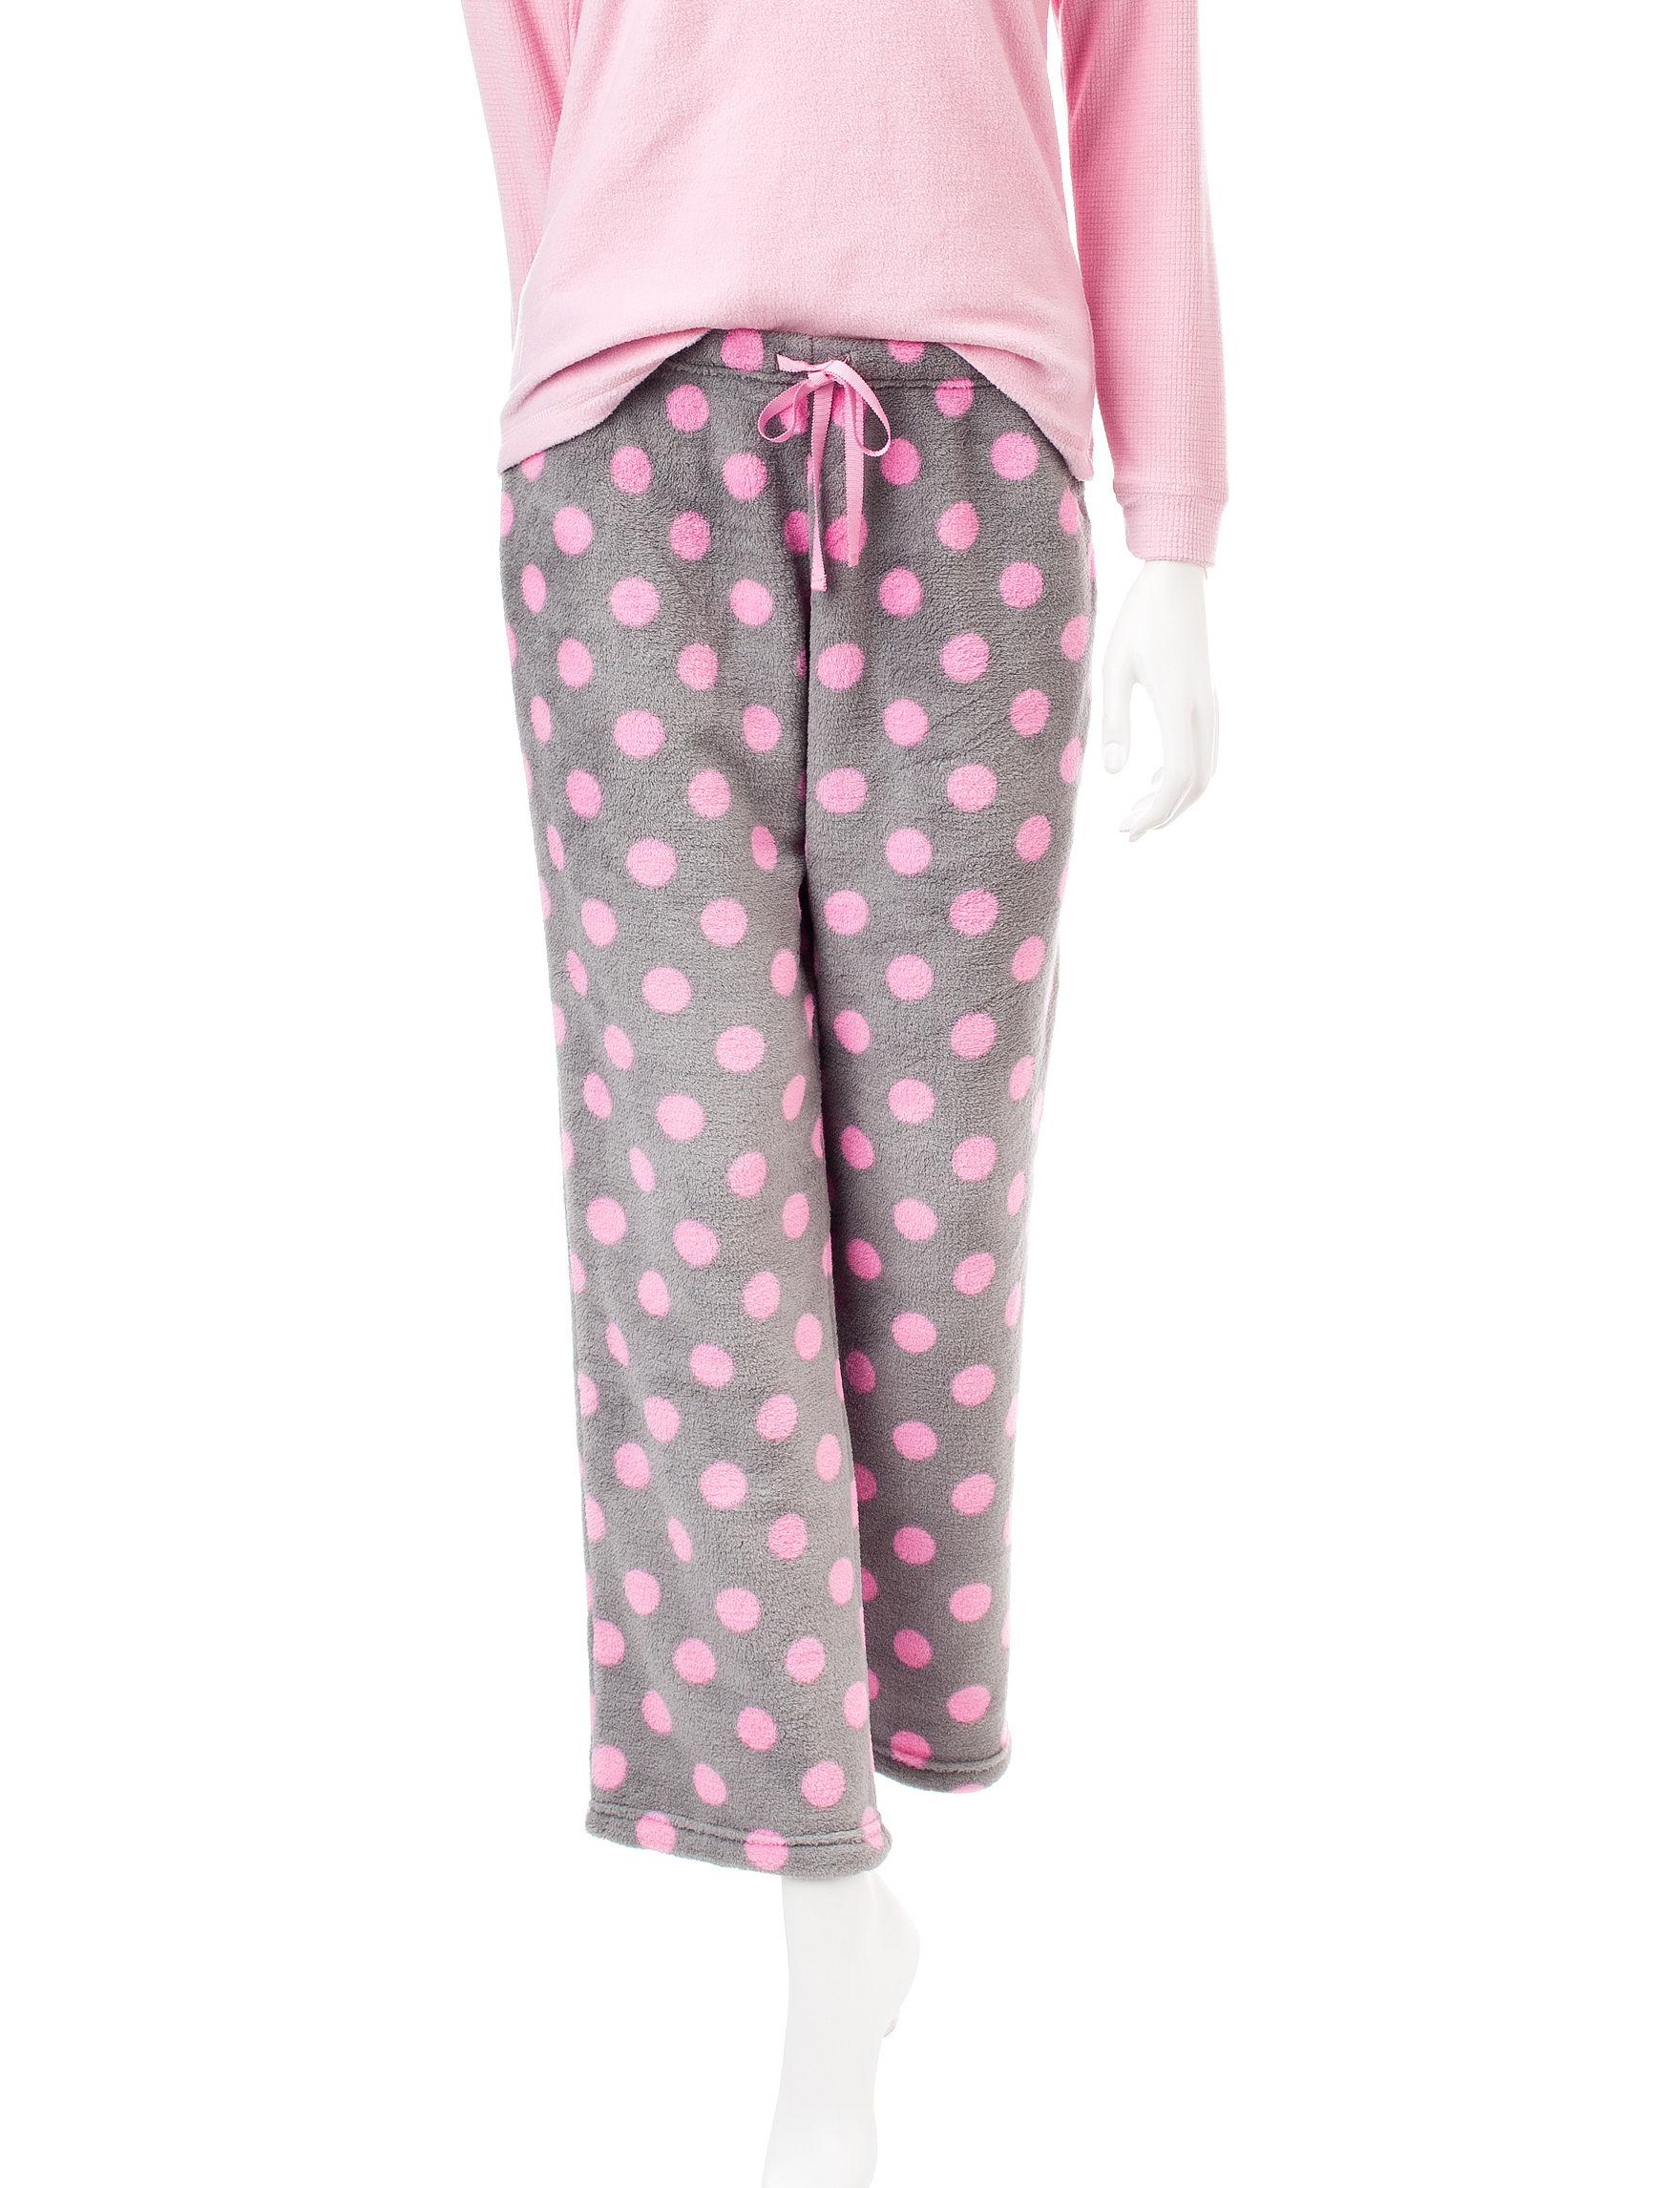 Wishful Park Grey Pajama Bottoms